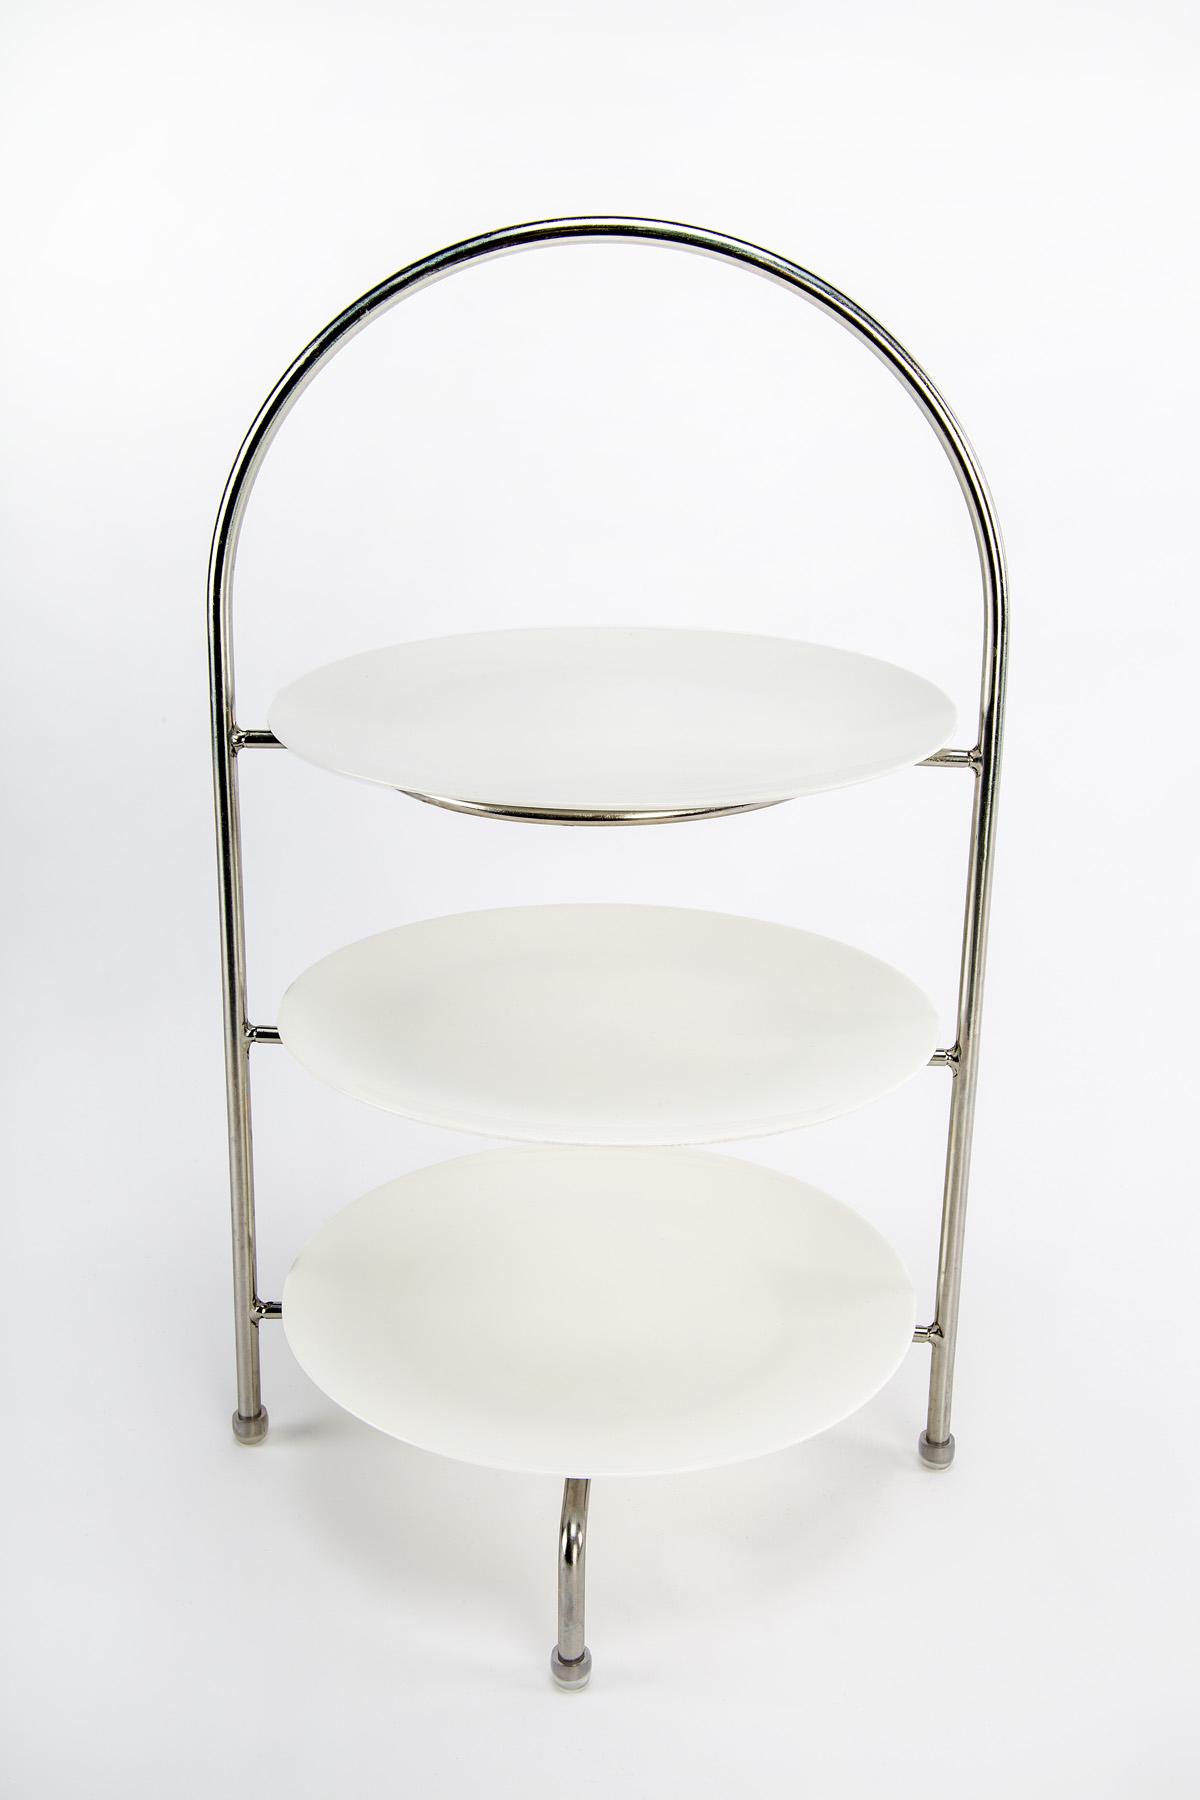 etagere f r drei teller 21cm vega die metzgerei mannheim. Black Bedroom Furniture Sets. Home Design Ideas